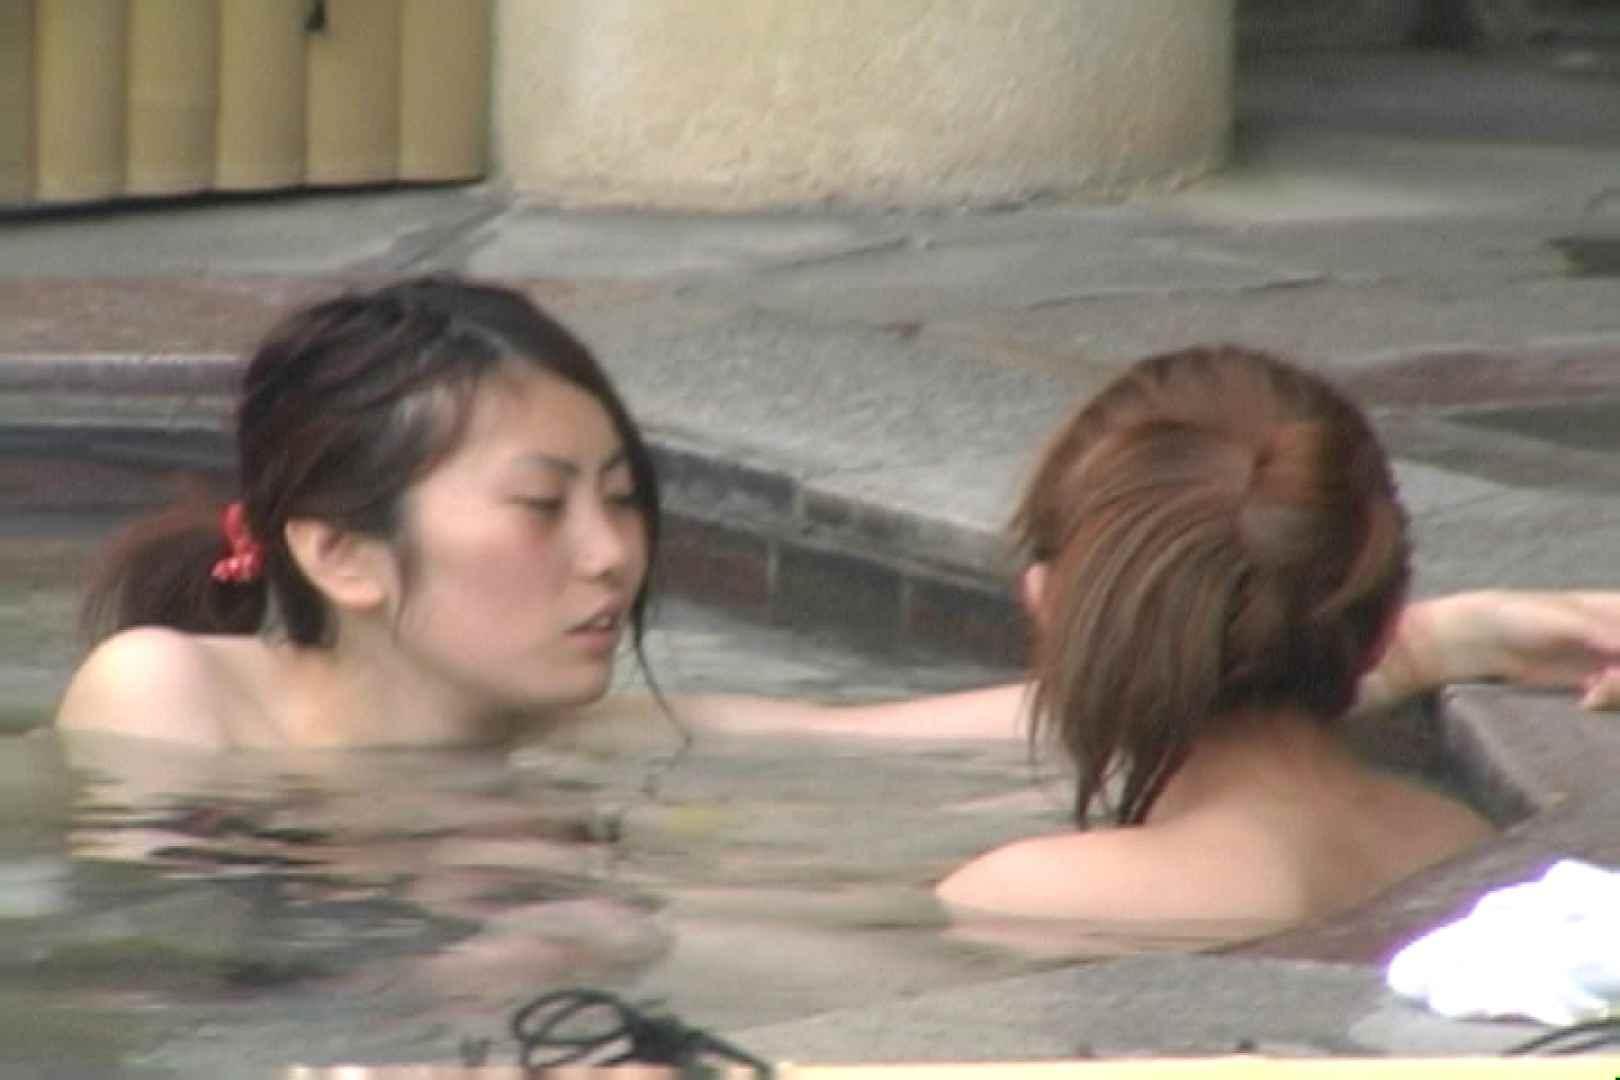 Aquaな露天風呂Vol.29【VIP】 盗撮 AV動画キャプチャ 78枚 62